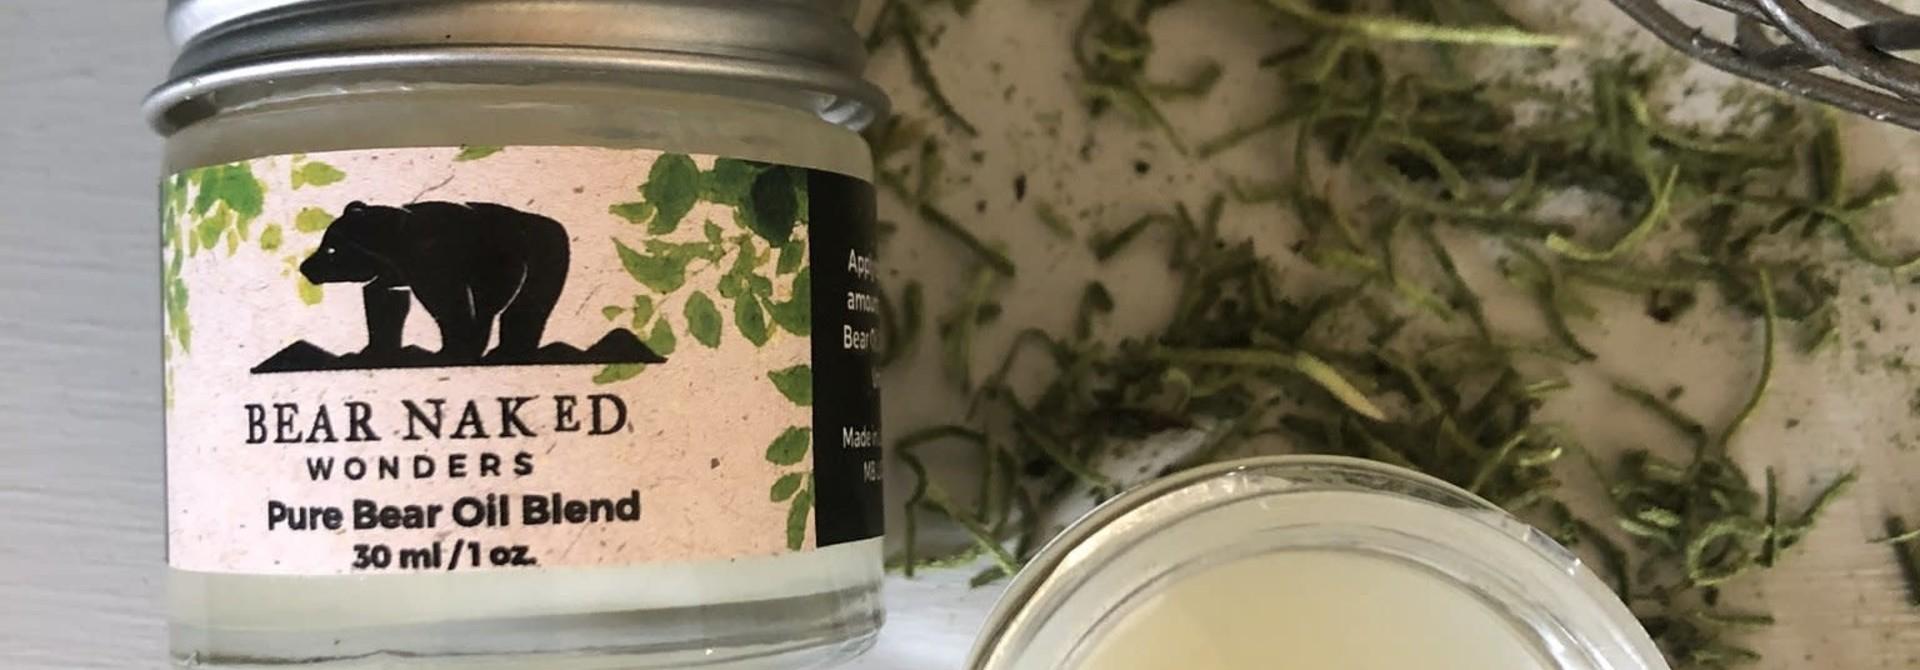 Pure Bear Oil Blend